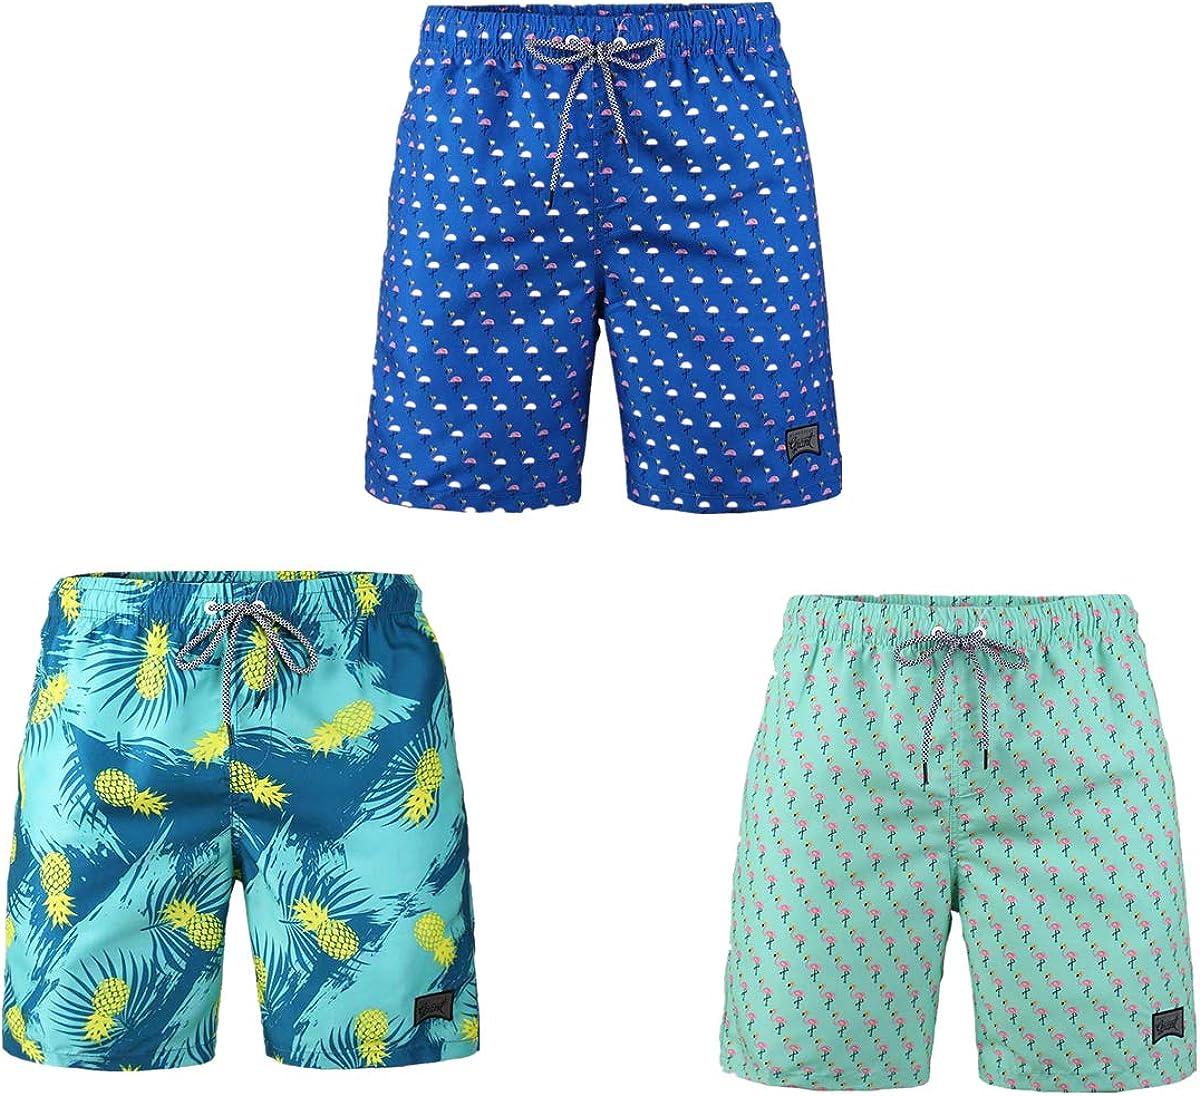 Beautiful Giant 3-PC Pack Men's Board Shorts with Pockets Vacation Hawaiian Soft Comfy Waterproof Swim Pants